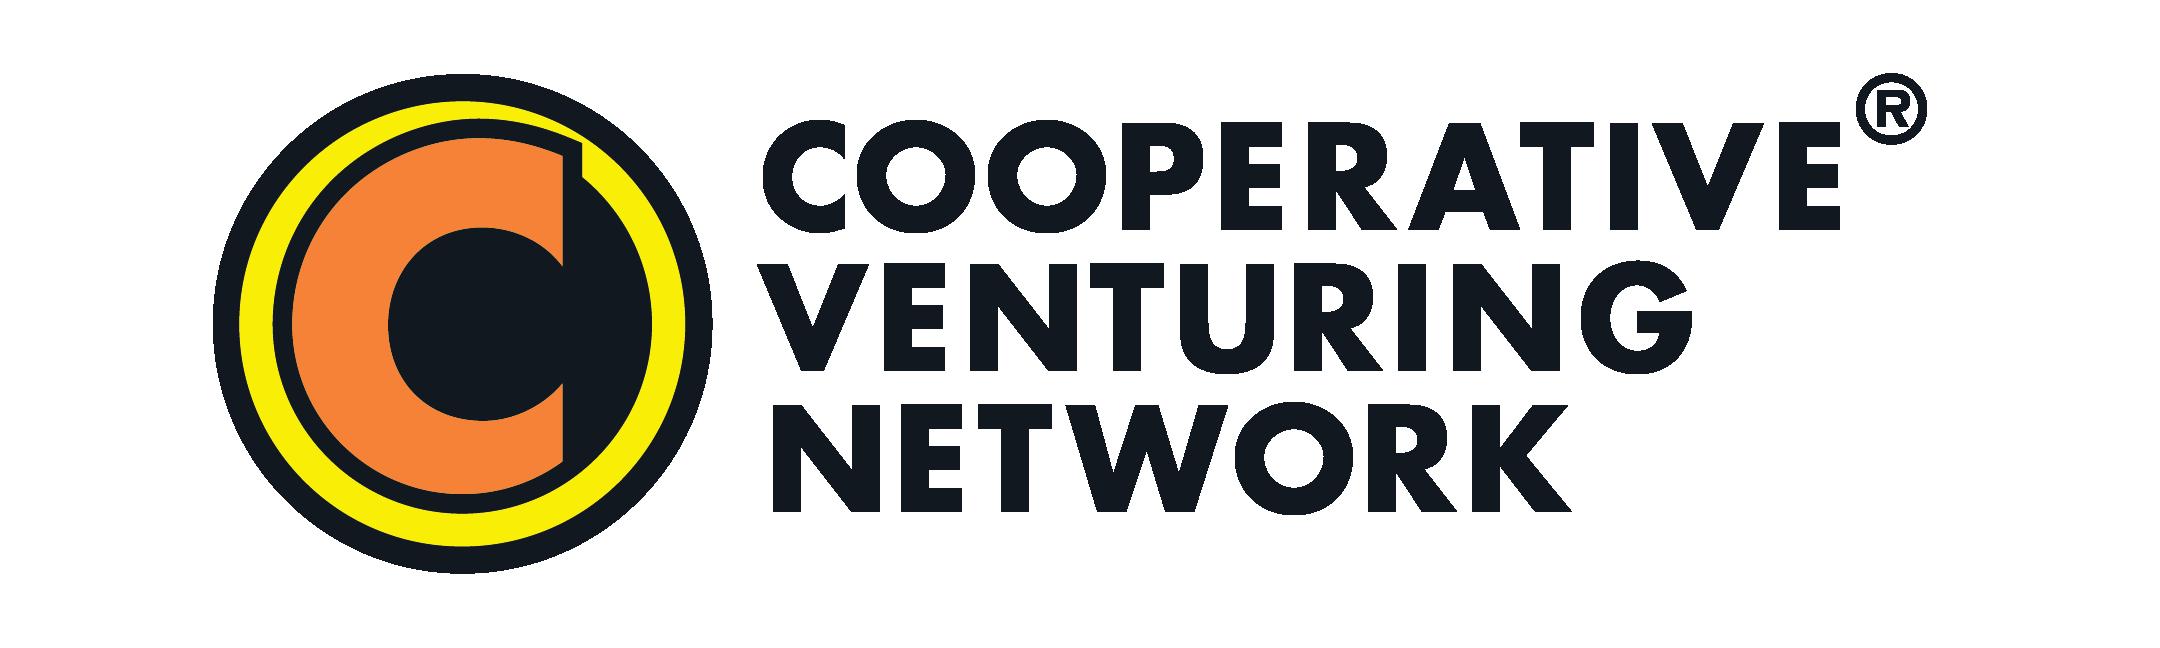 Cooperative Venturing Network